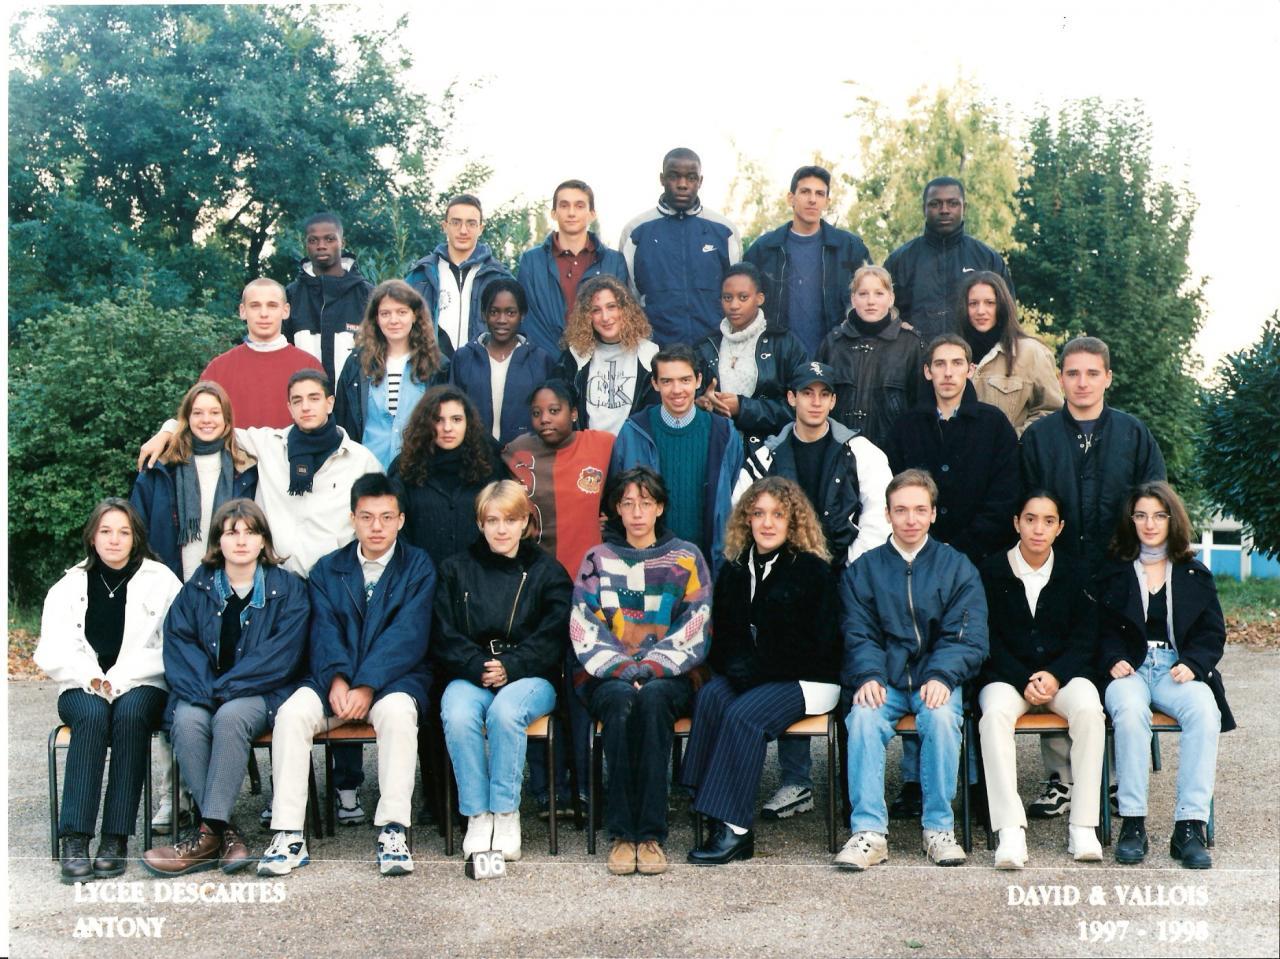 1998 - 1STT3 - DAVID